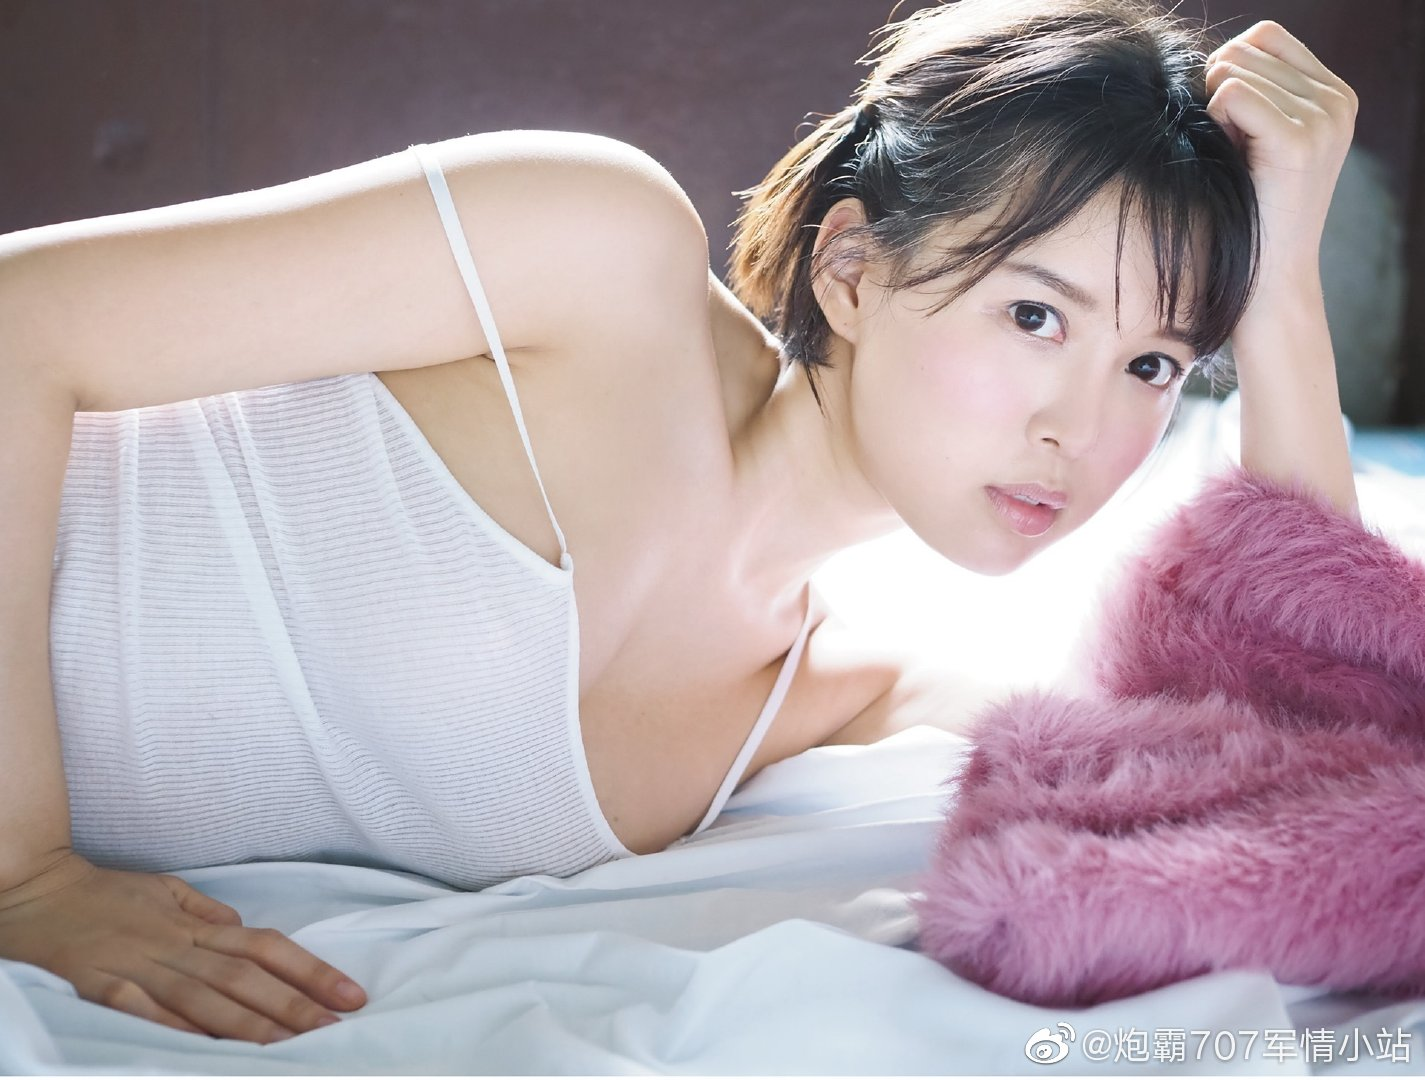 葵司 Tsukasa Aoi 作品大全-Tsukasa Aoi-『游乐宫』Youlegong.com 第1张